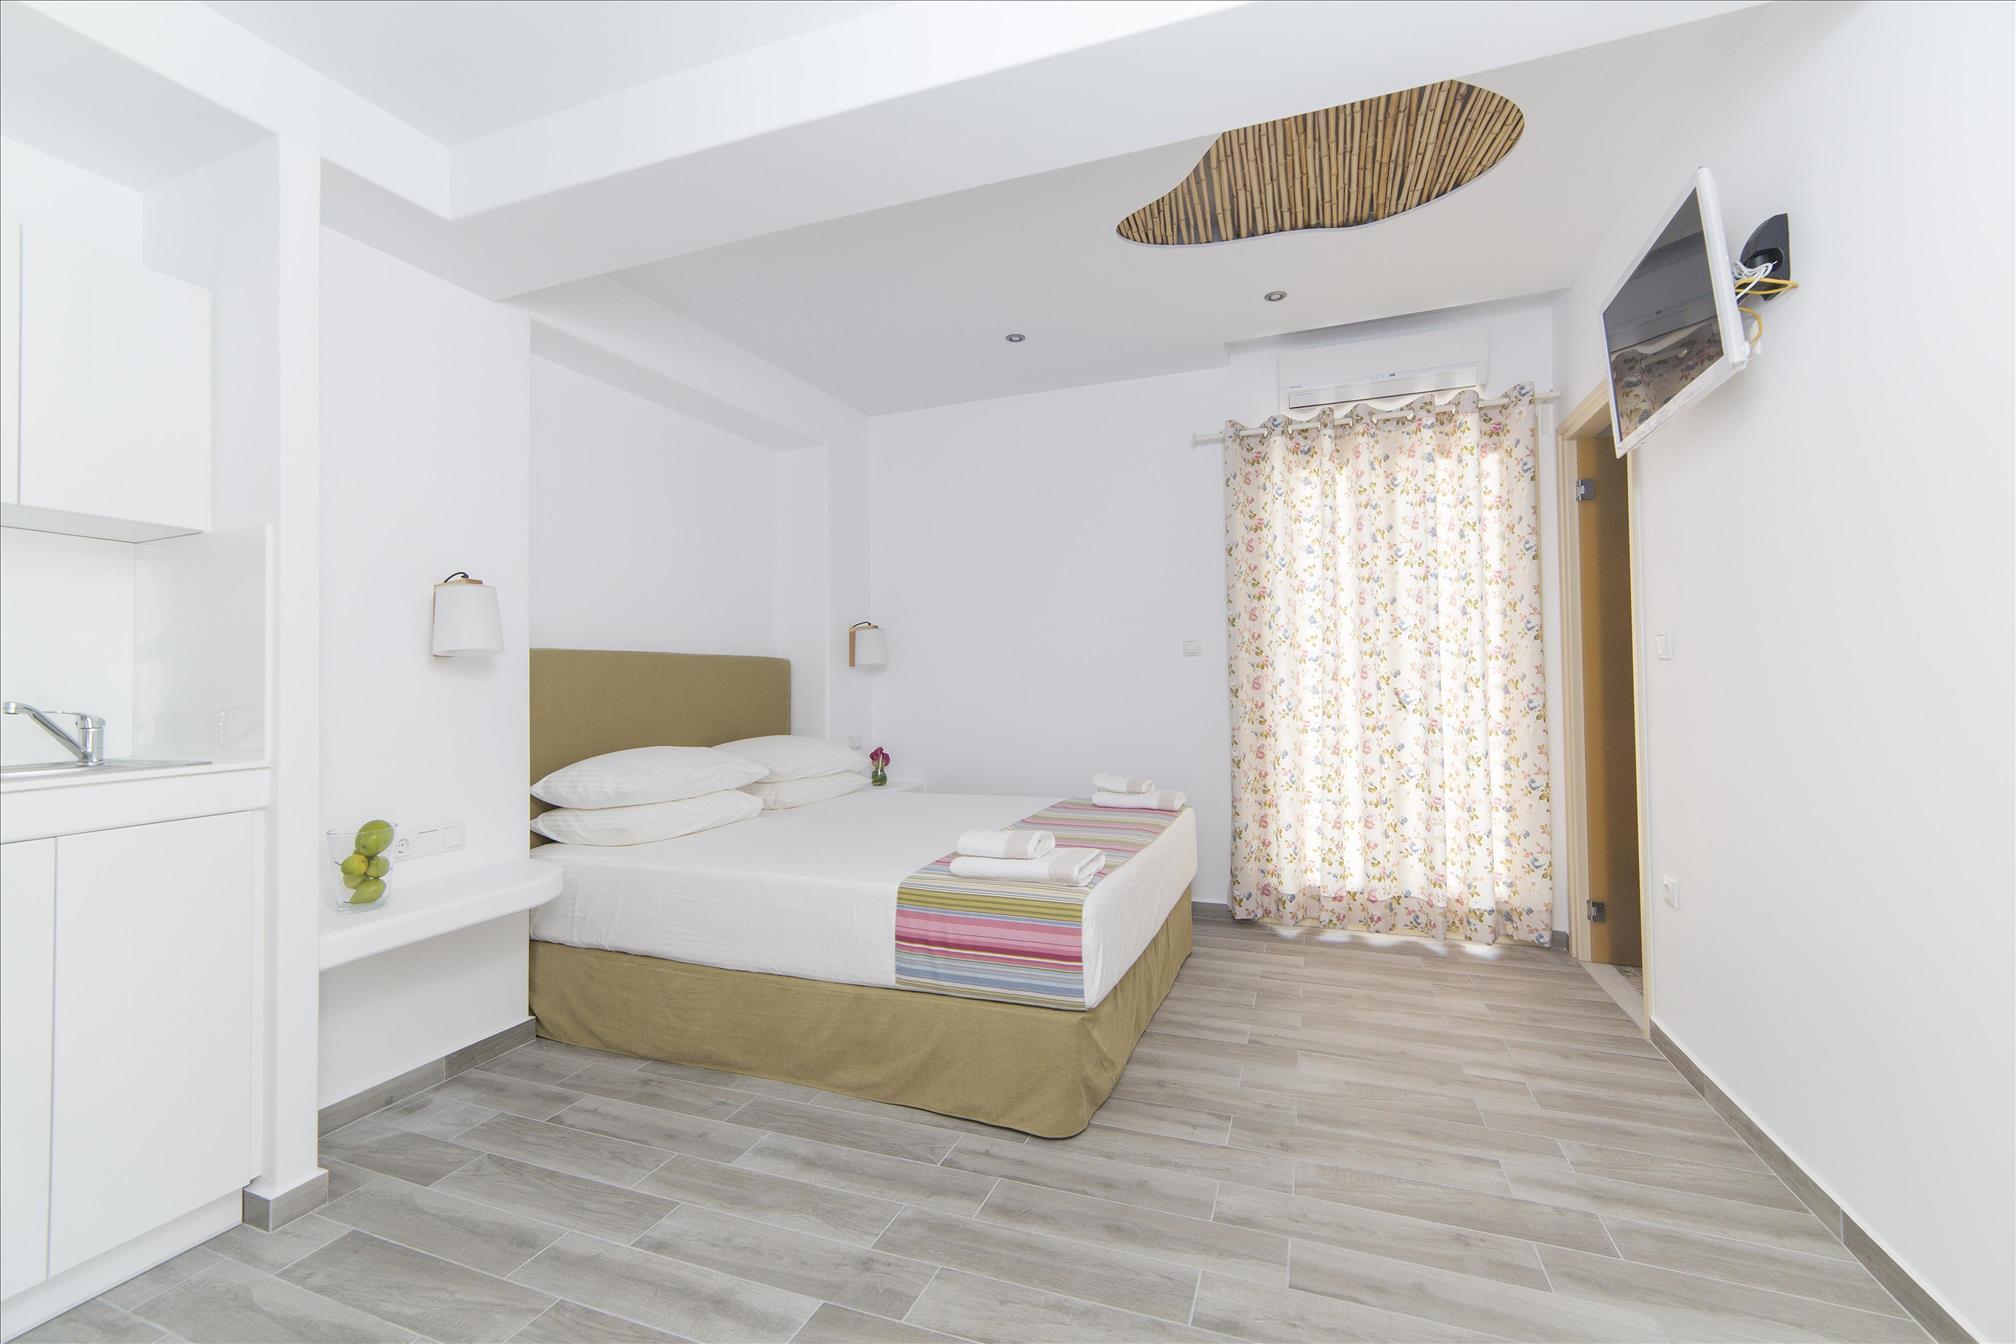 Naxos boutique hotel korali for Boutique hotel naxos